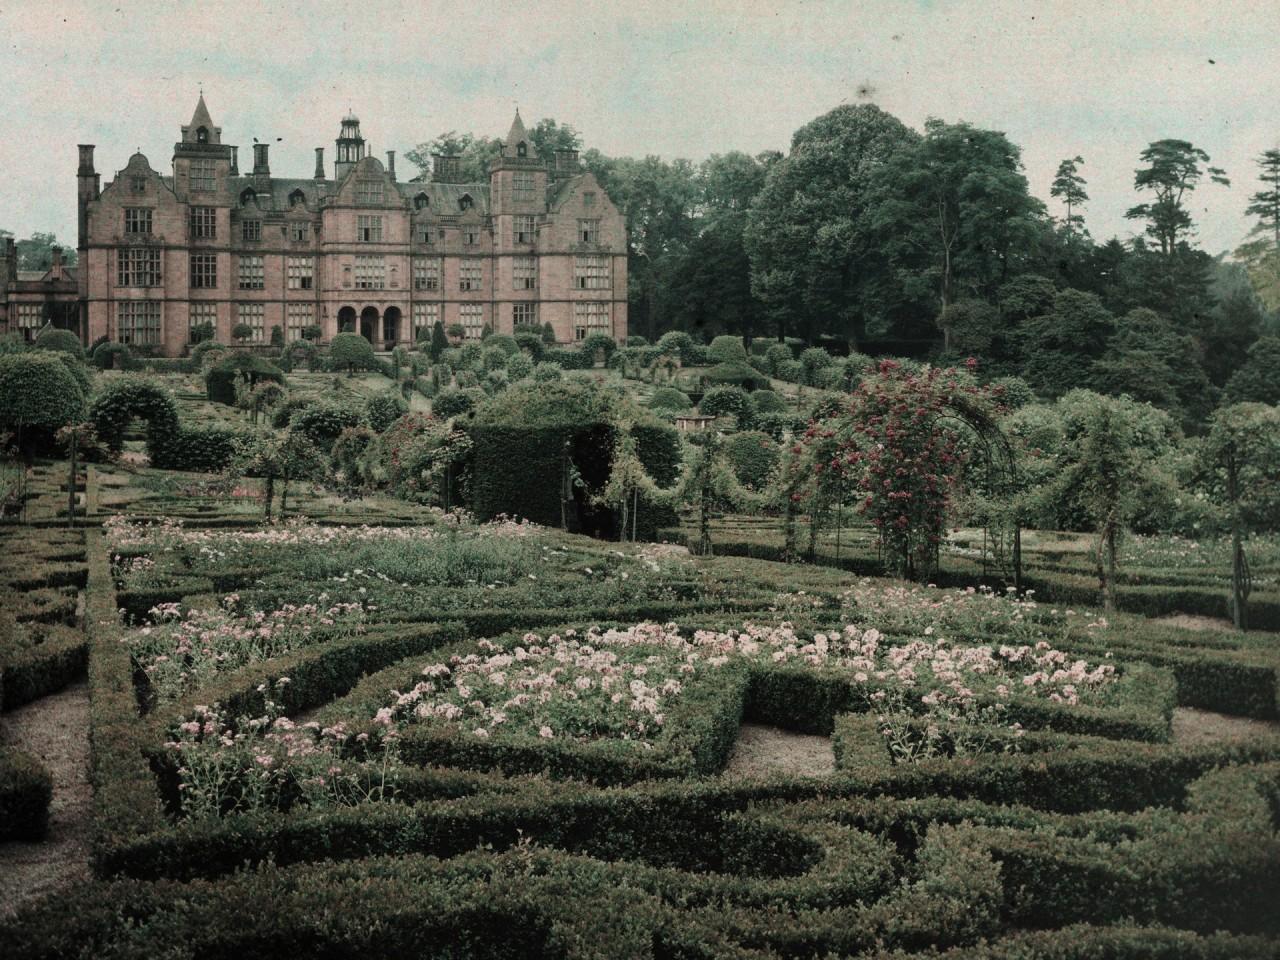 Загородный дом в Вустершире, Англия, 1910 – 1915. Автохром, фотограф Артур Э. Мортон